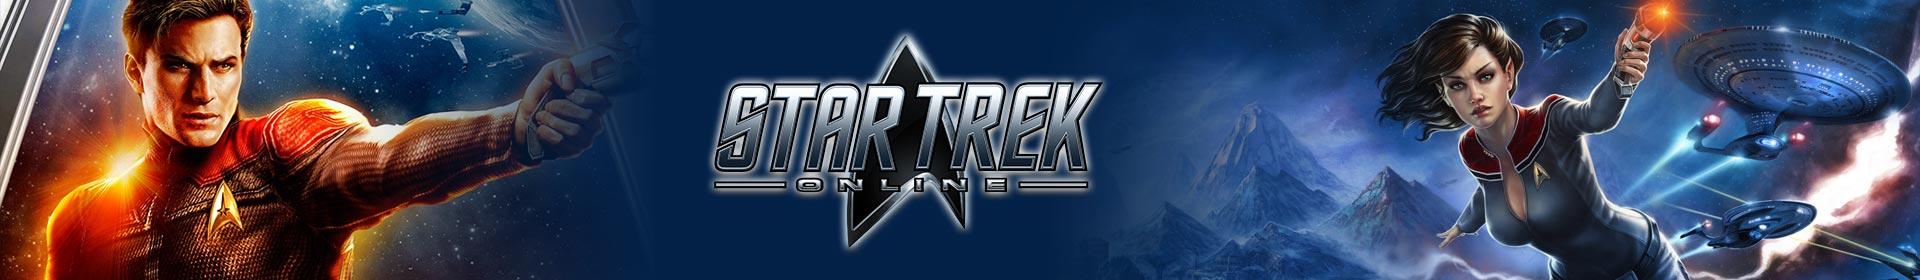 Star Trek Online Energy Credits